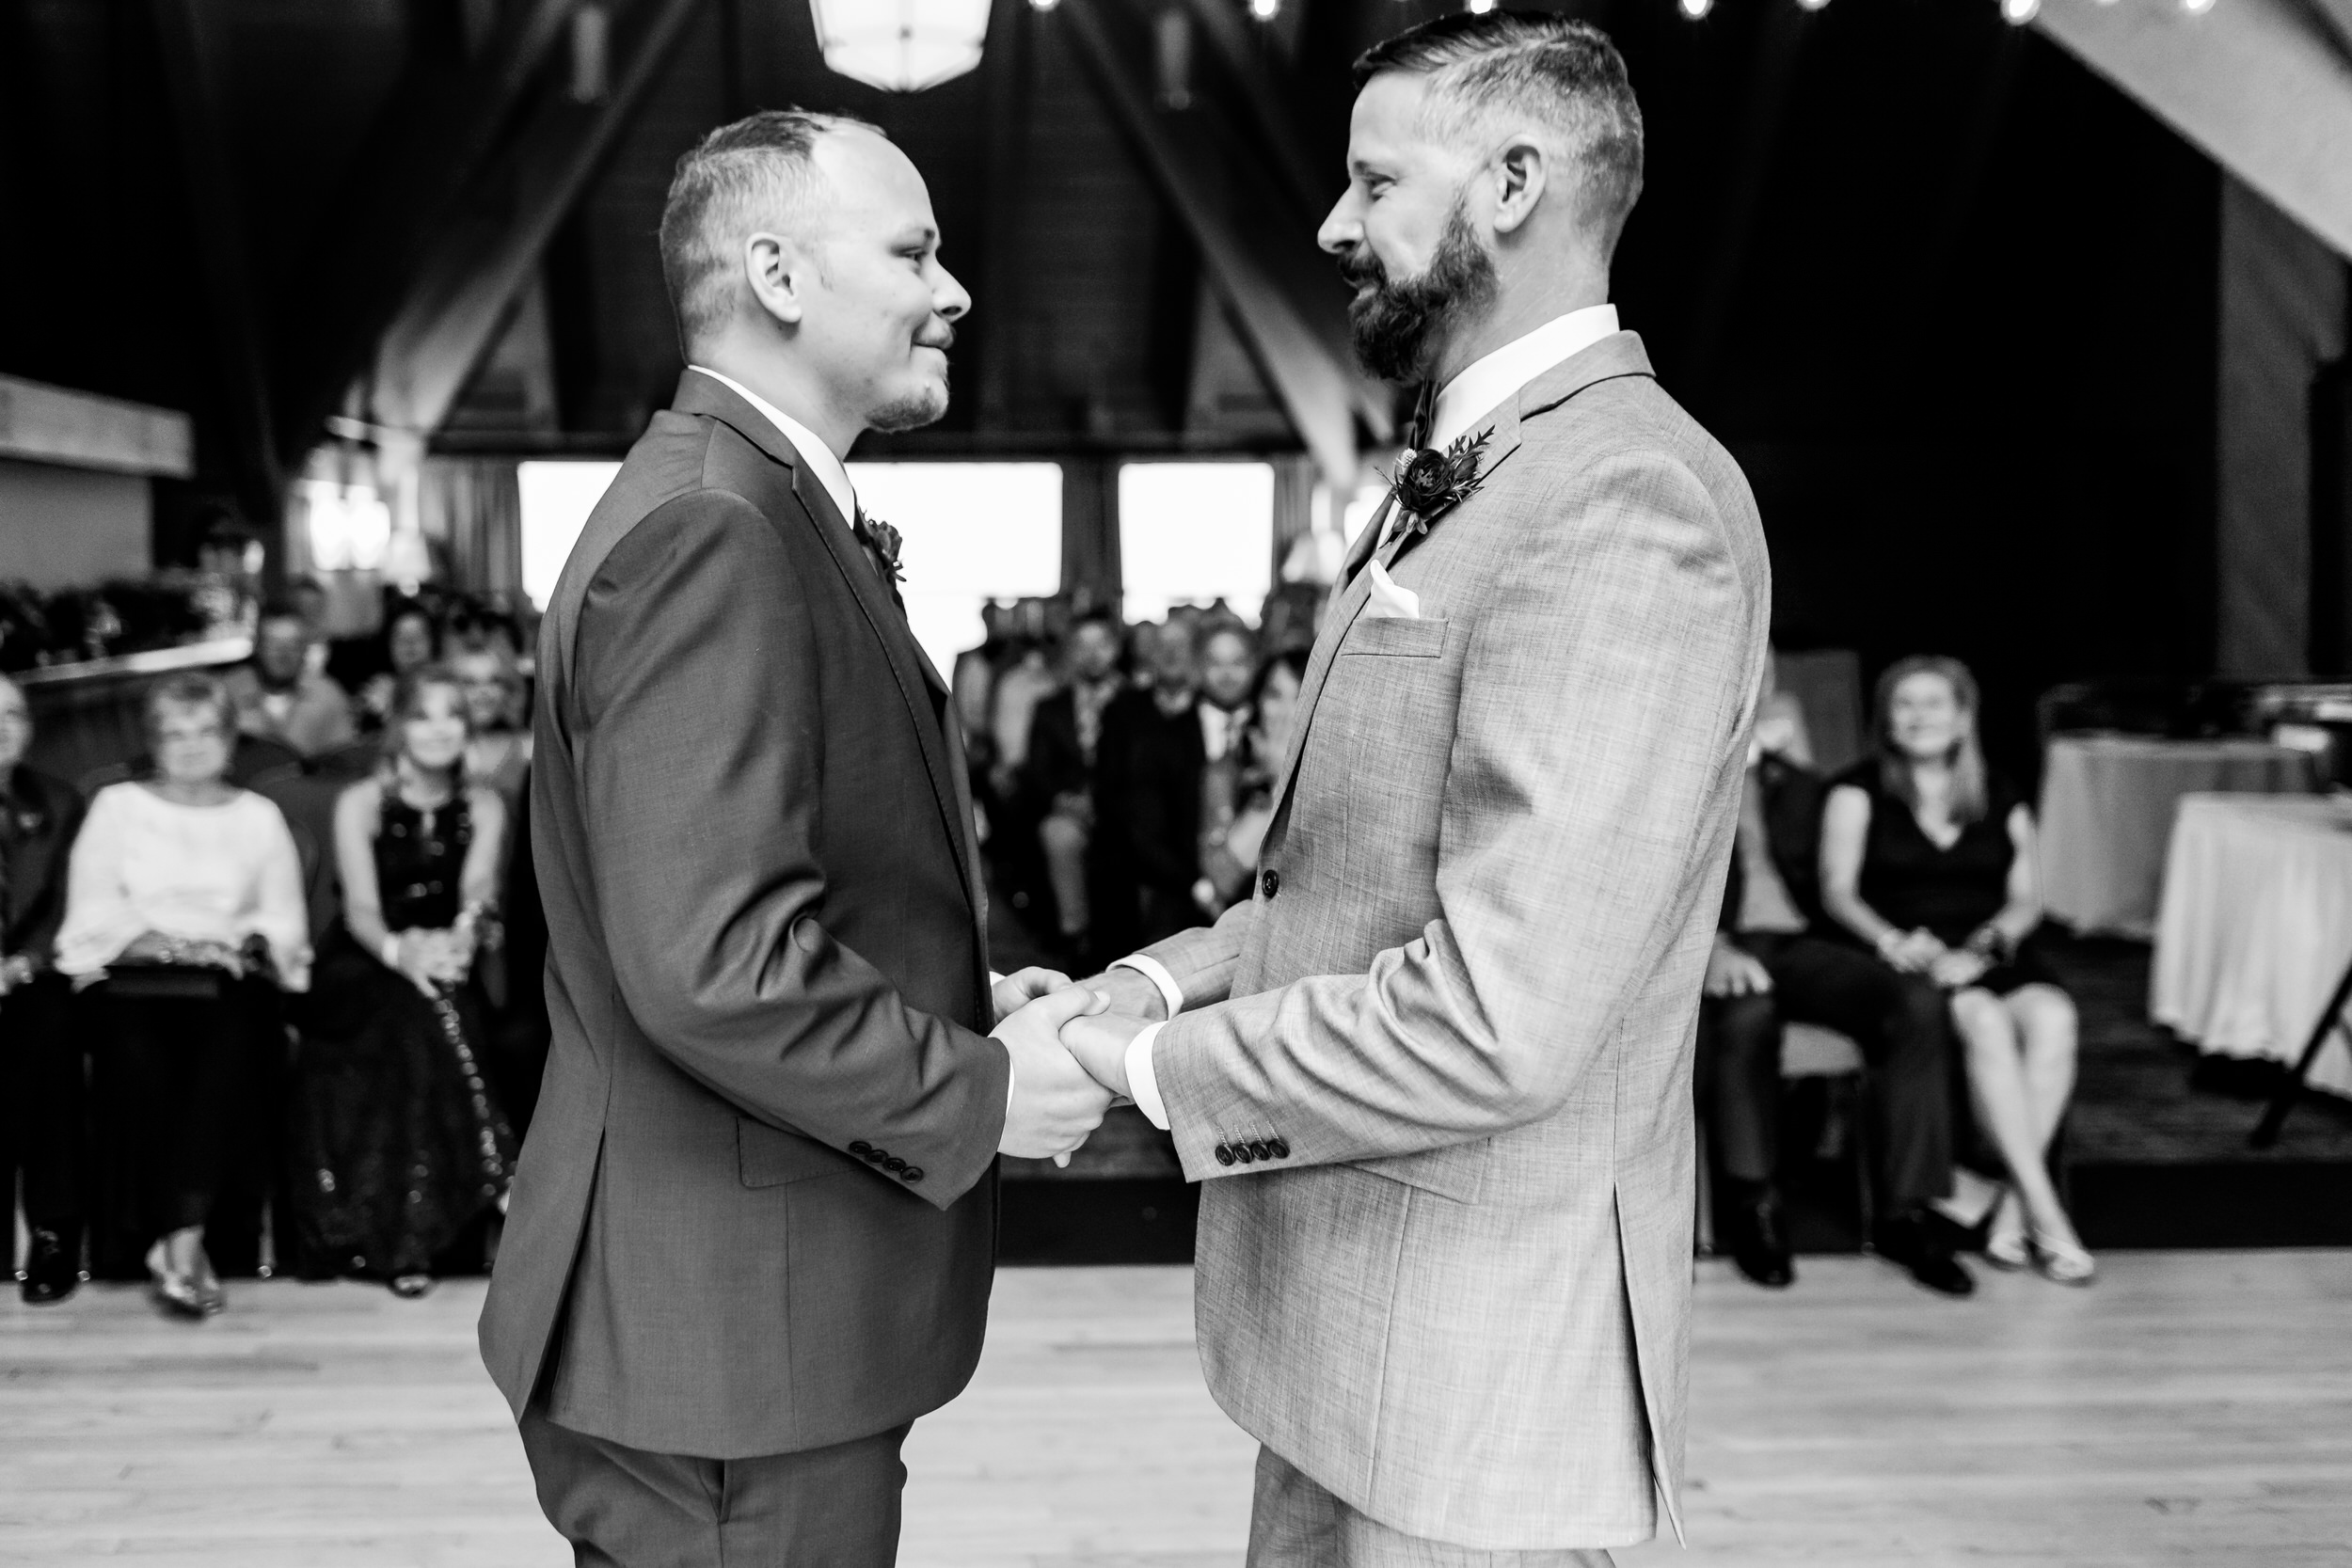 timberline_lodge_wedding_coltonjames_005